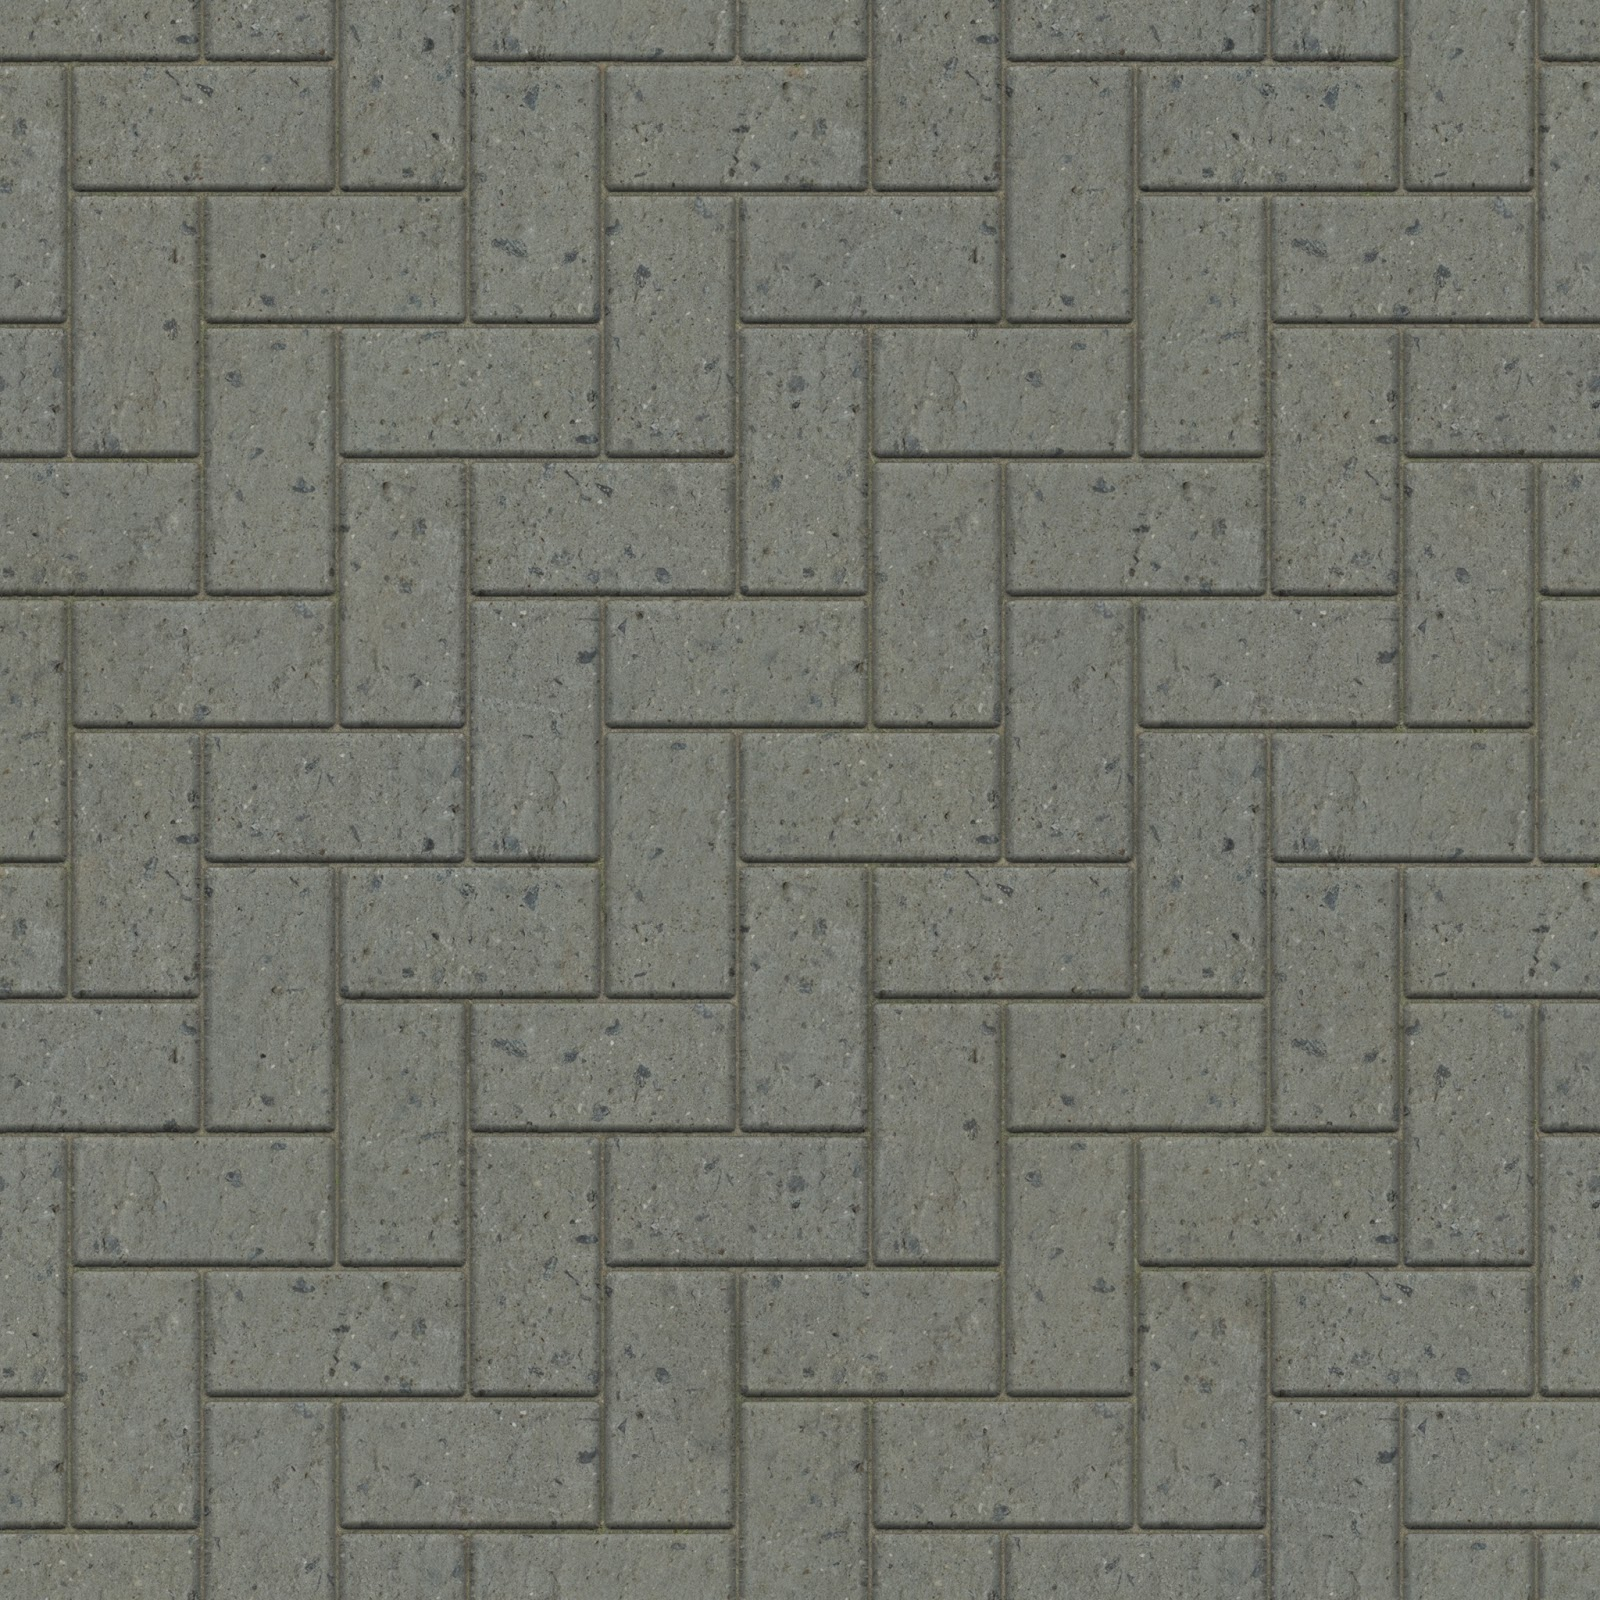 Stone Block Sprite : High resolution seamless textures october